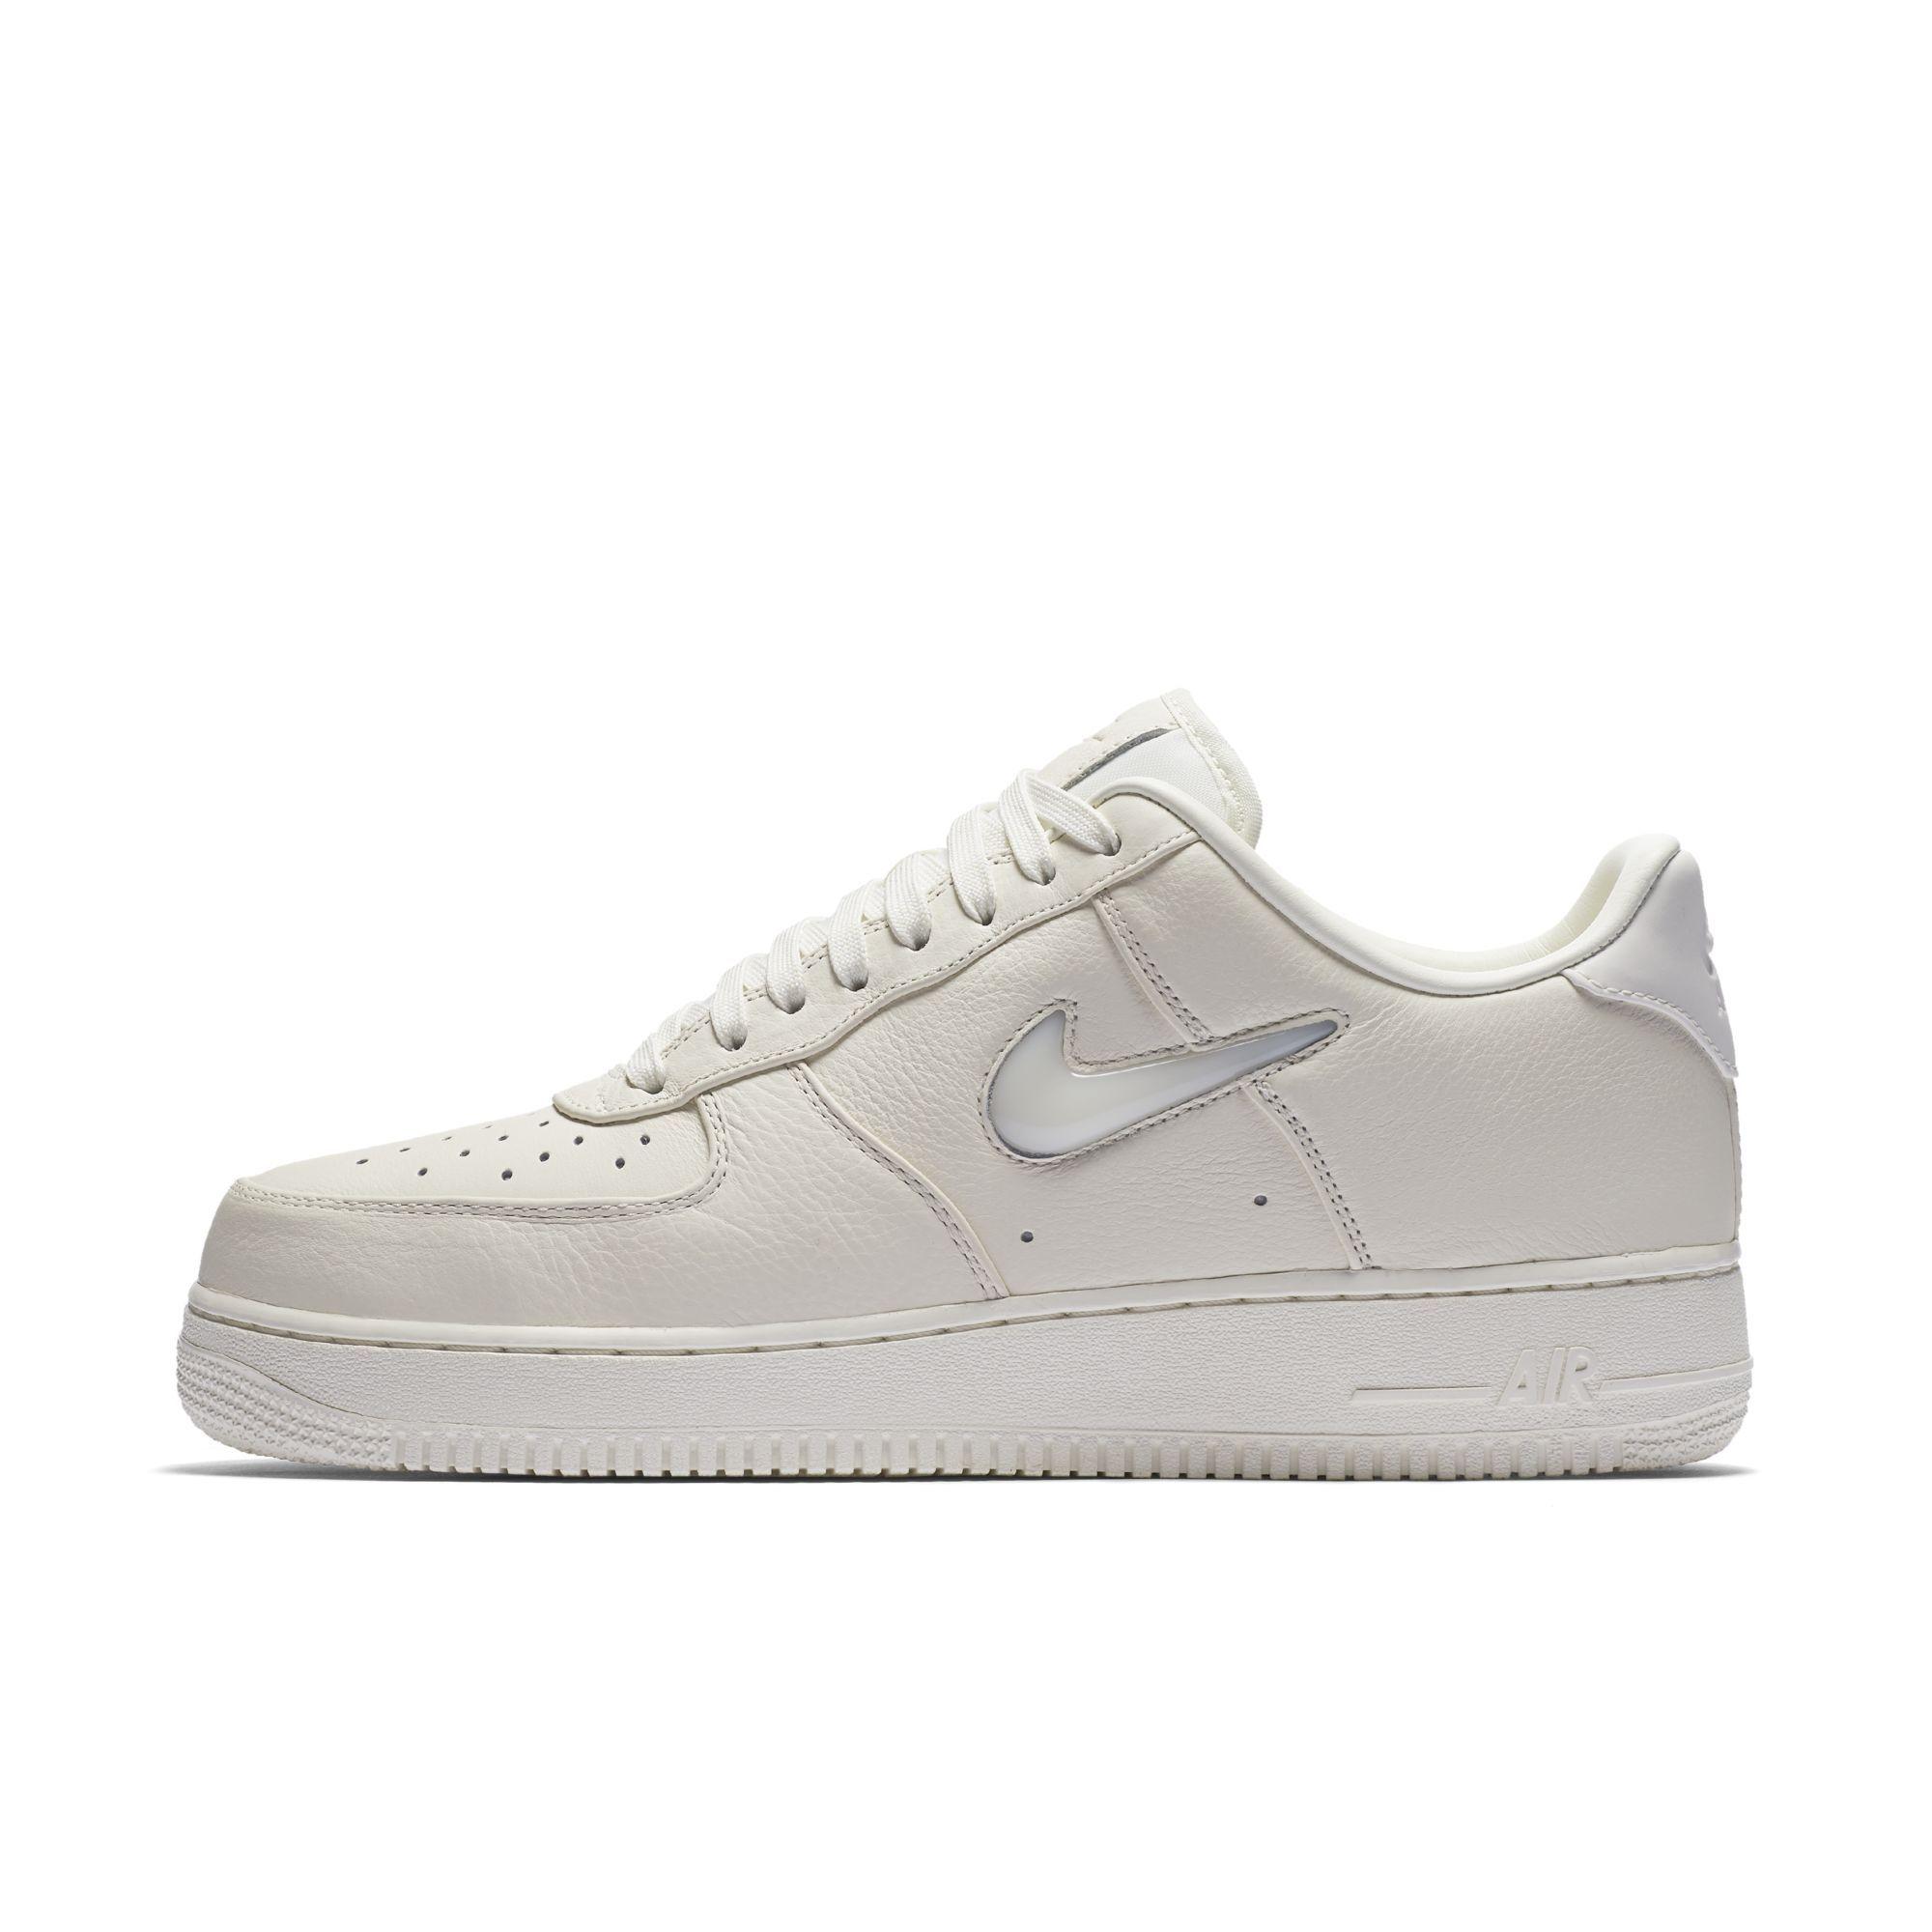 Nike Air Force 1 Jewel Wiosna 2017 Nike Free Shoes Sneakers Men Fashion Sneaker Magazine